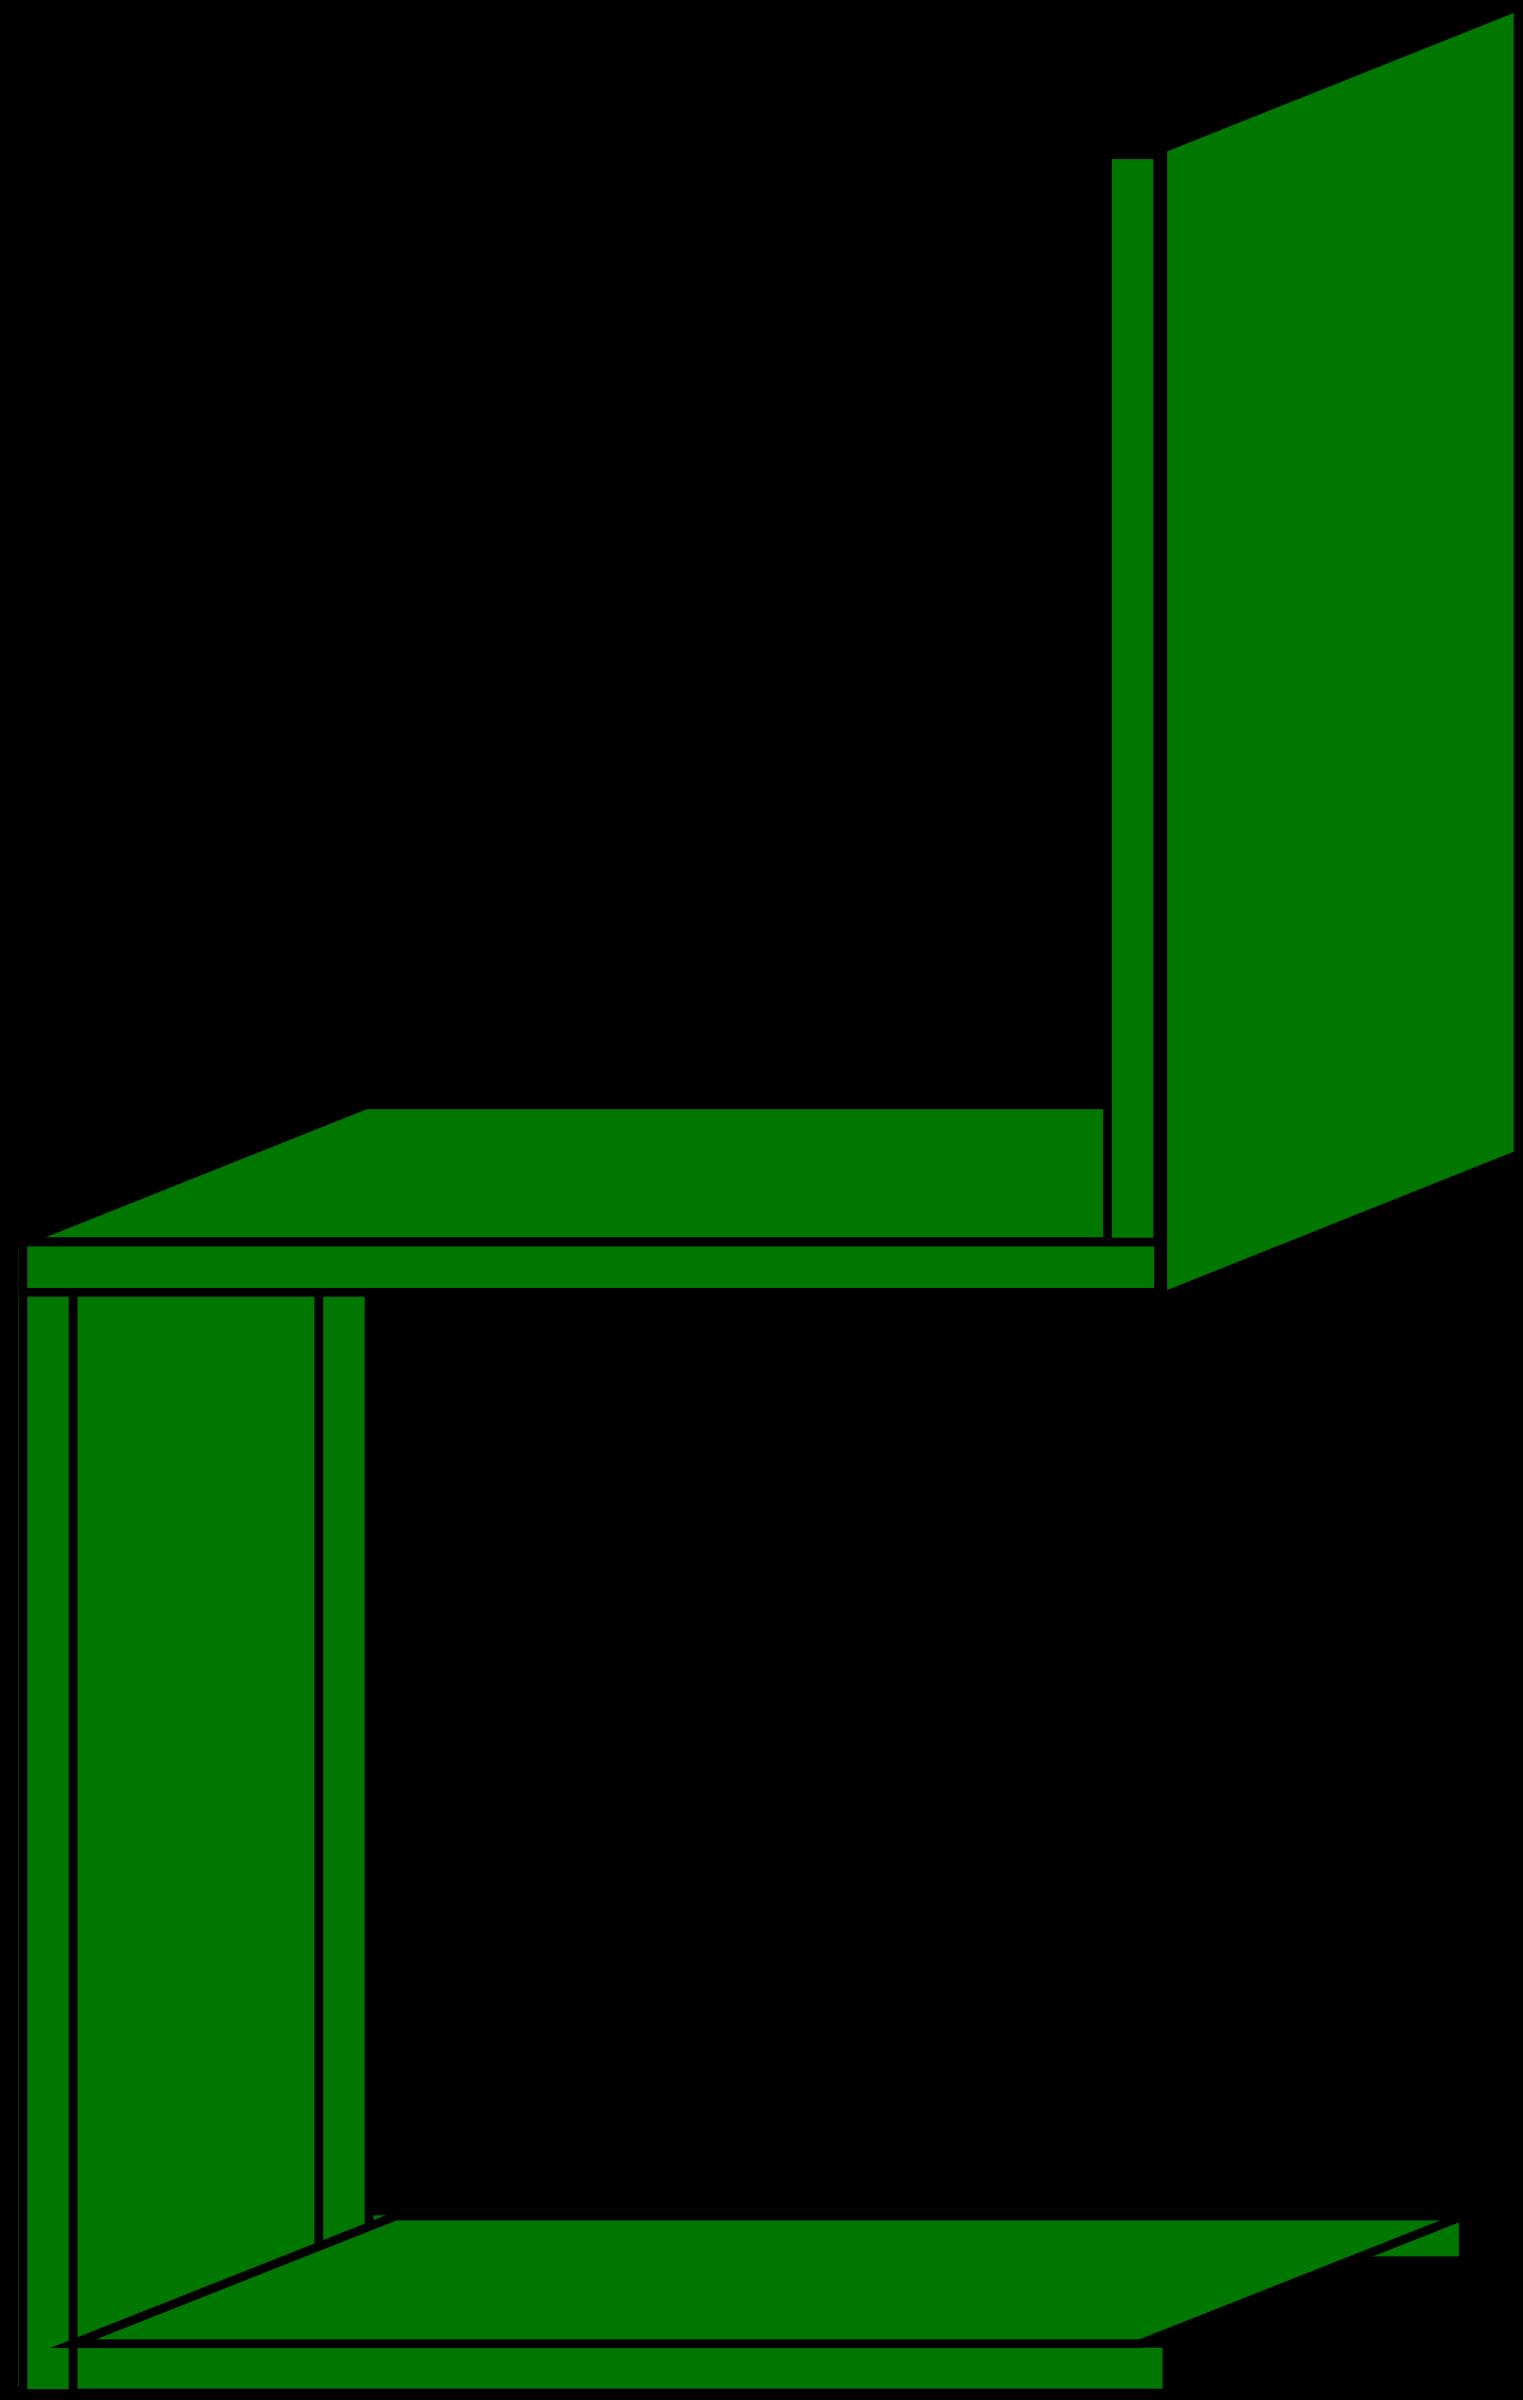 Diamond clipart minimalist. Green chair side view